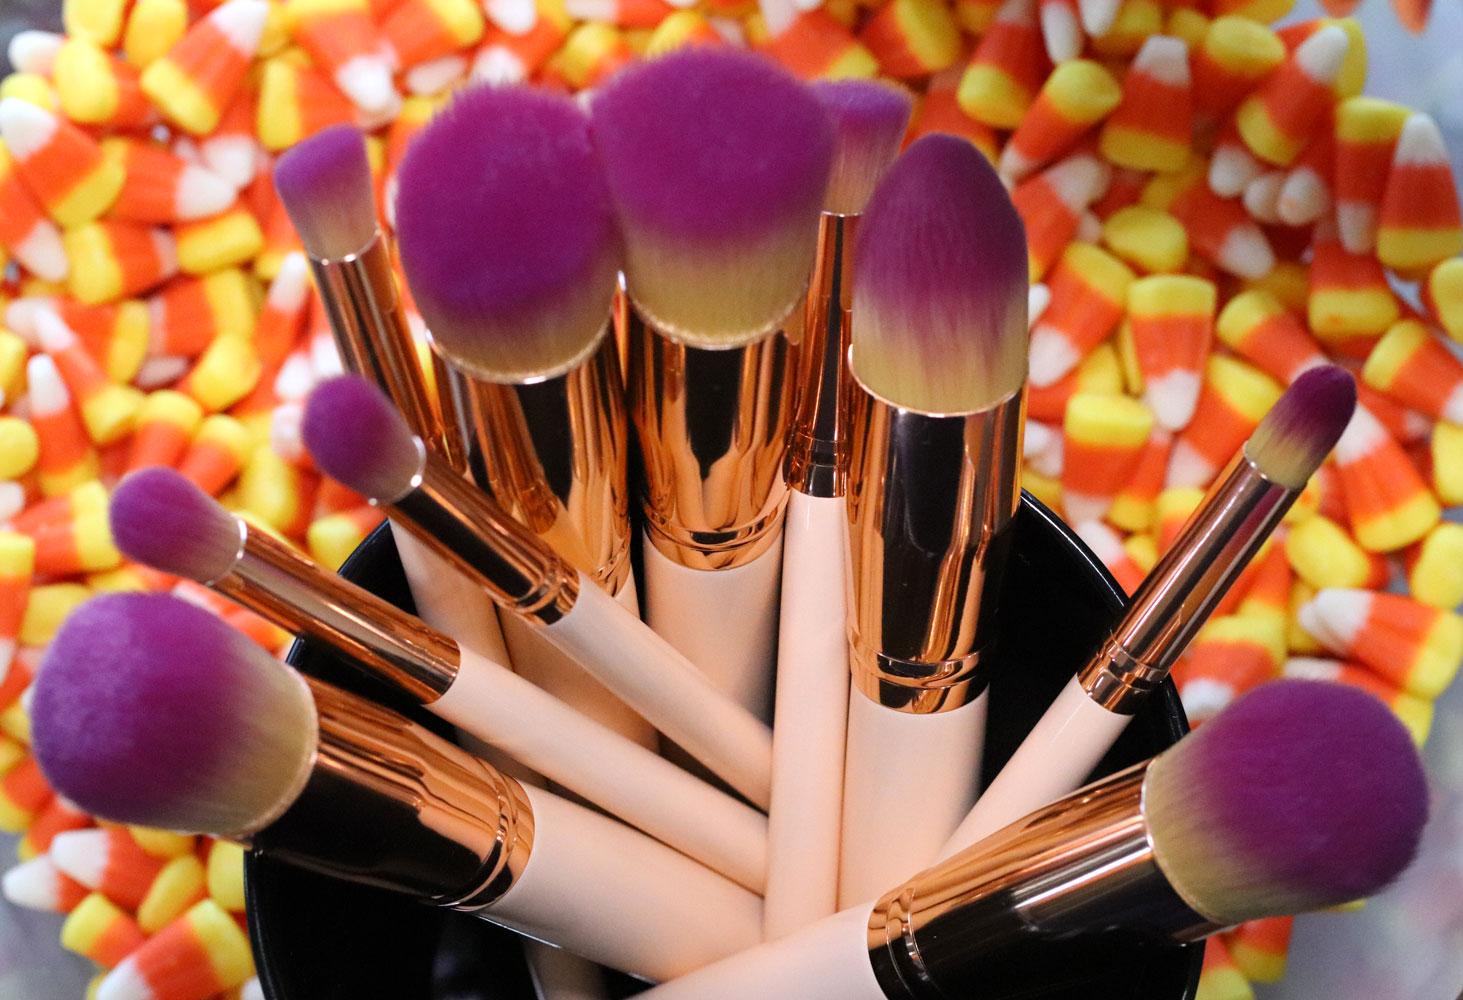 Giveaway - Vegan makeup brush set from The Vegan Warehouse